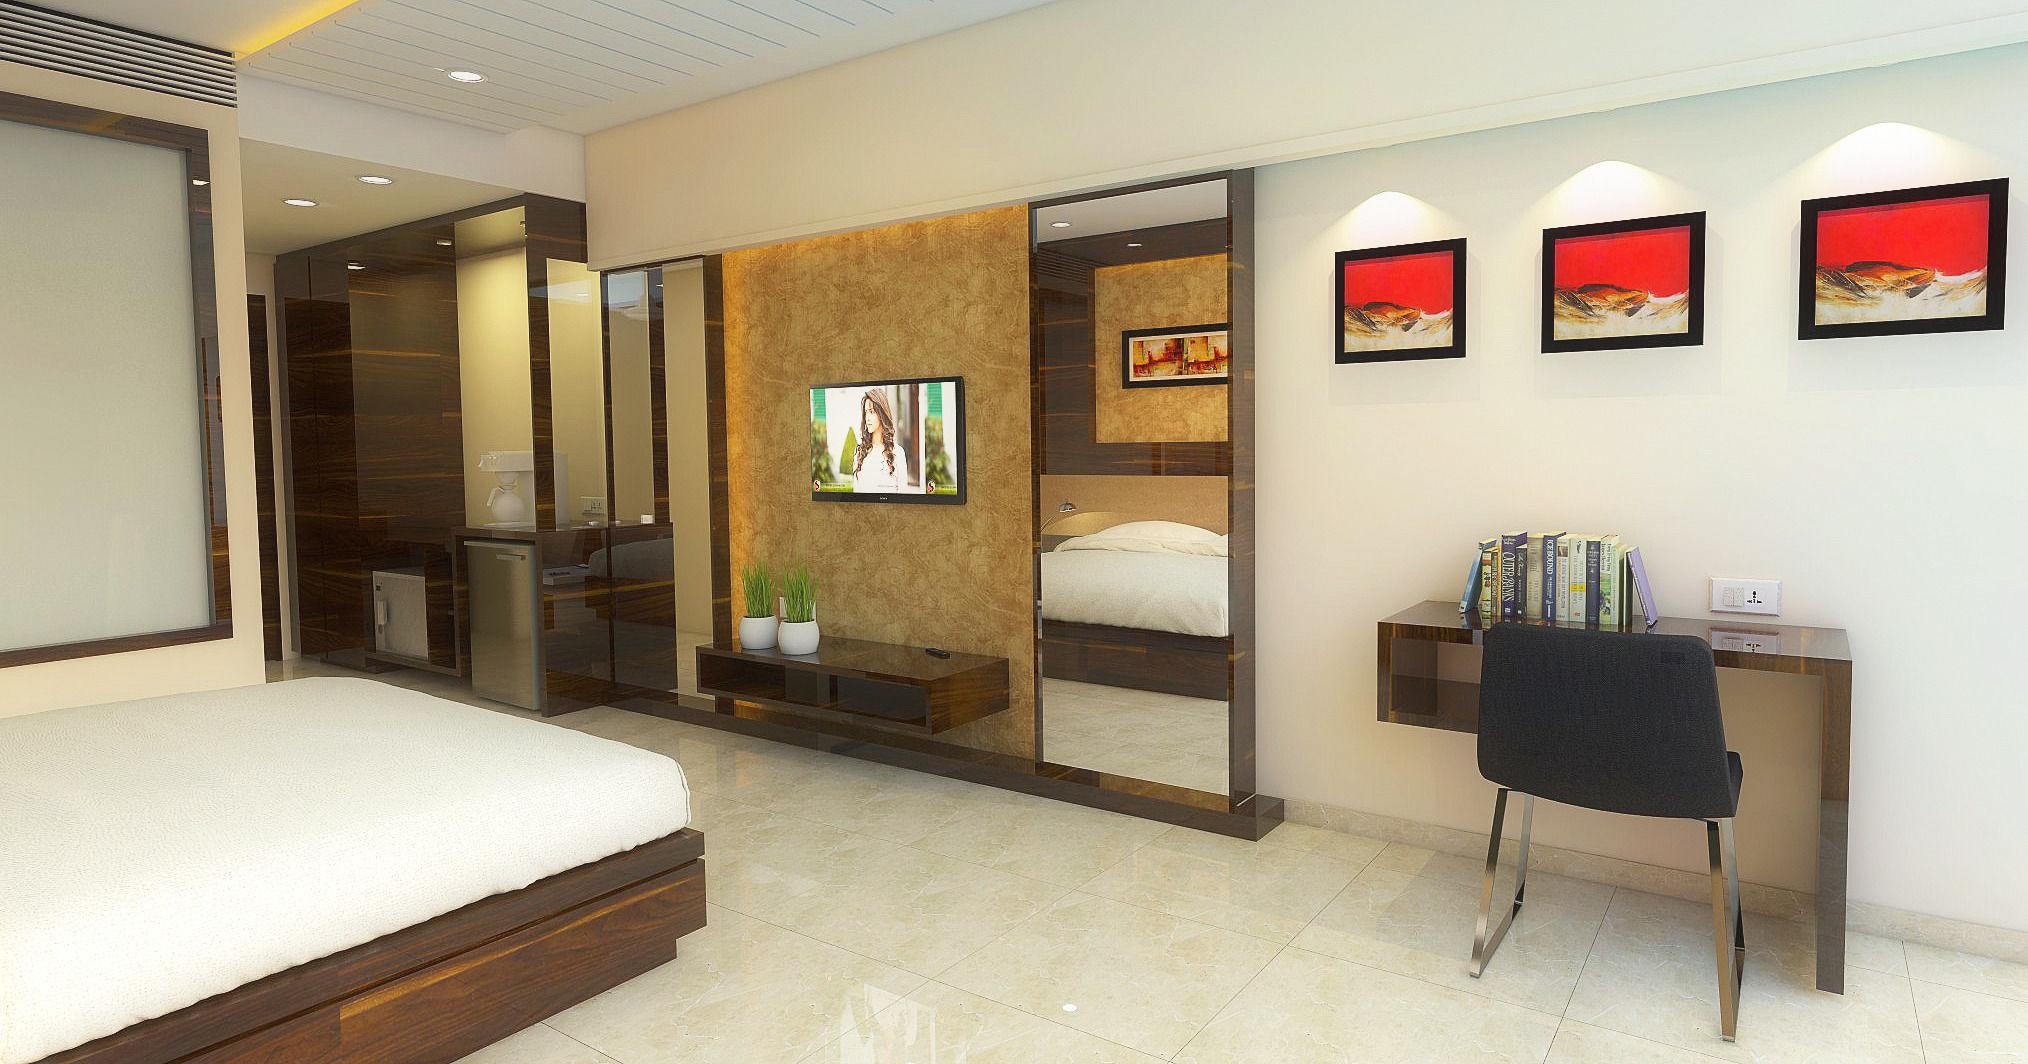 Bedroom Furniture 3d Models hotel bedroom 3d interior view | cgtrader